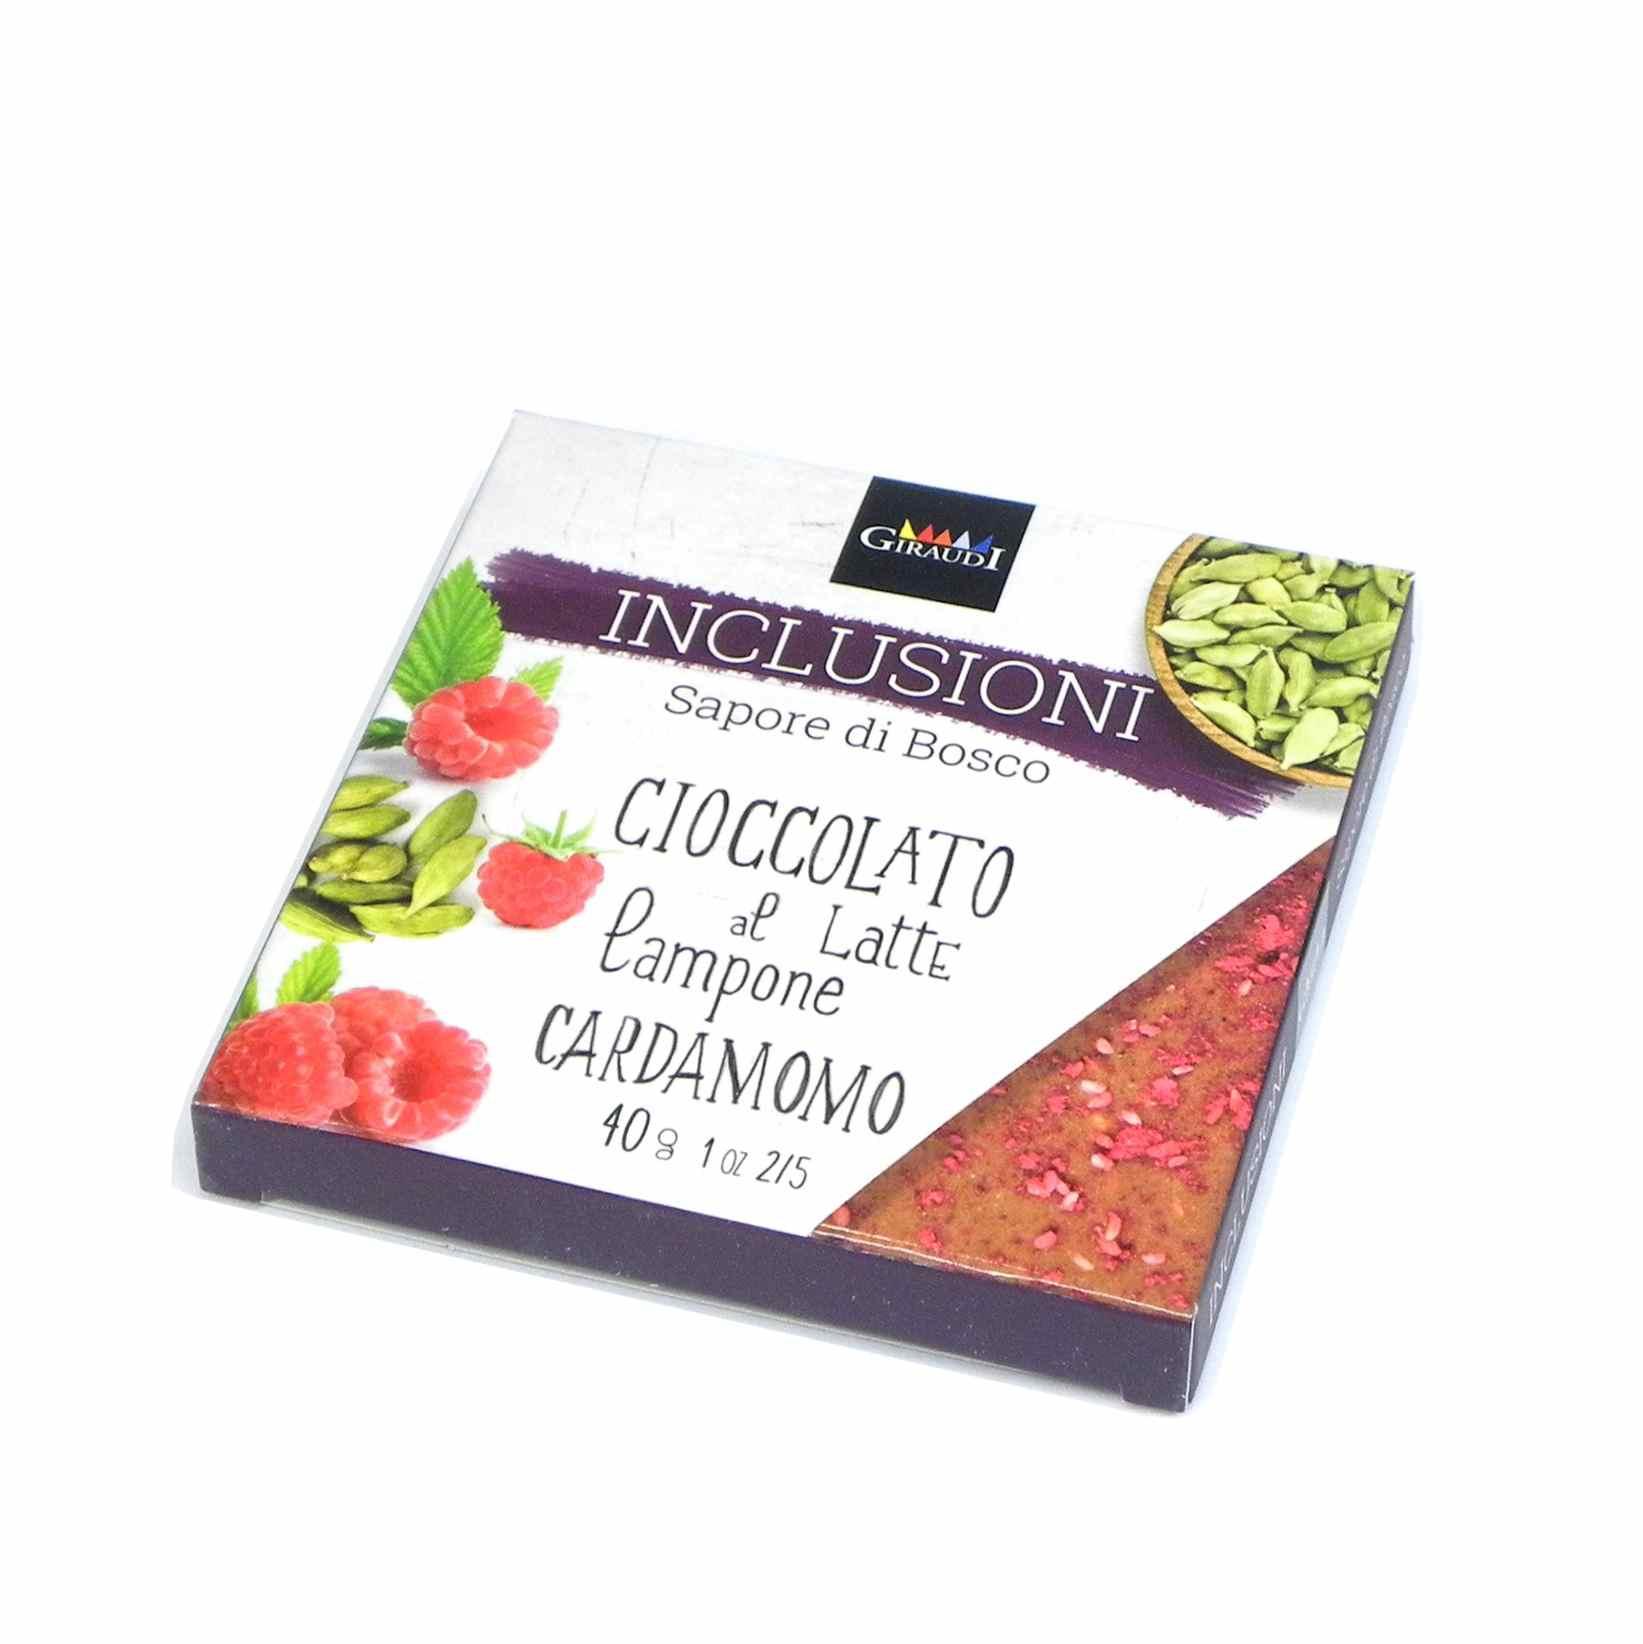 Giraudi inclusioni chocolate Raspberry Cardamom – Giraudi inclusioni cioccolato lampone cardamomo – Gustorotondo – Italian food boutique